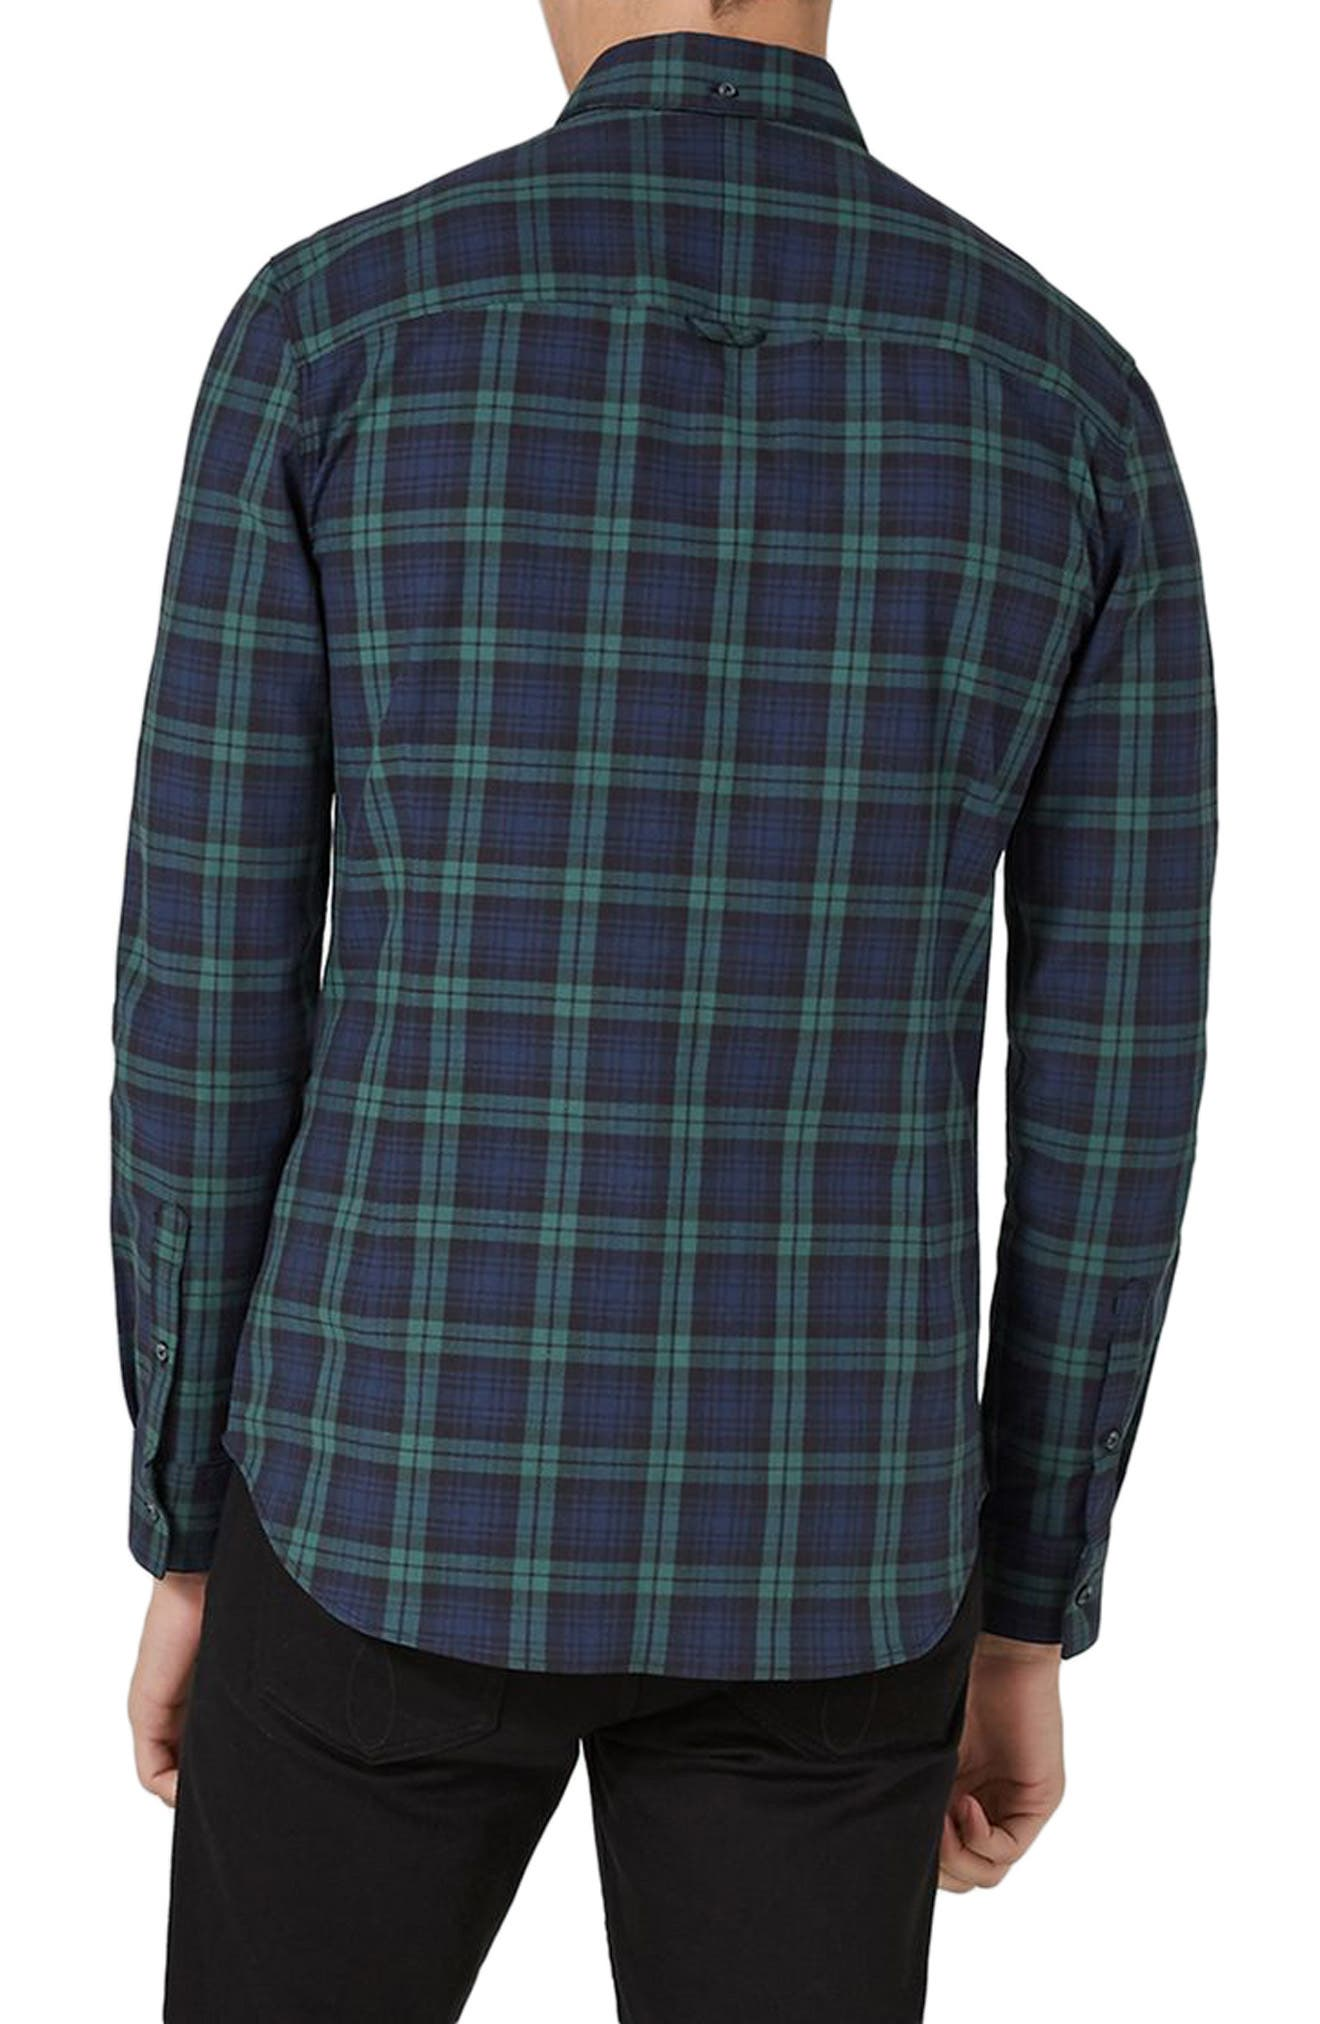 Muscle Fit Black Watch Plaid Shirt,                             Alternate thumbnail 2, color,                             Green Multi